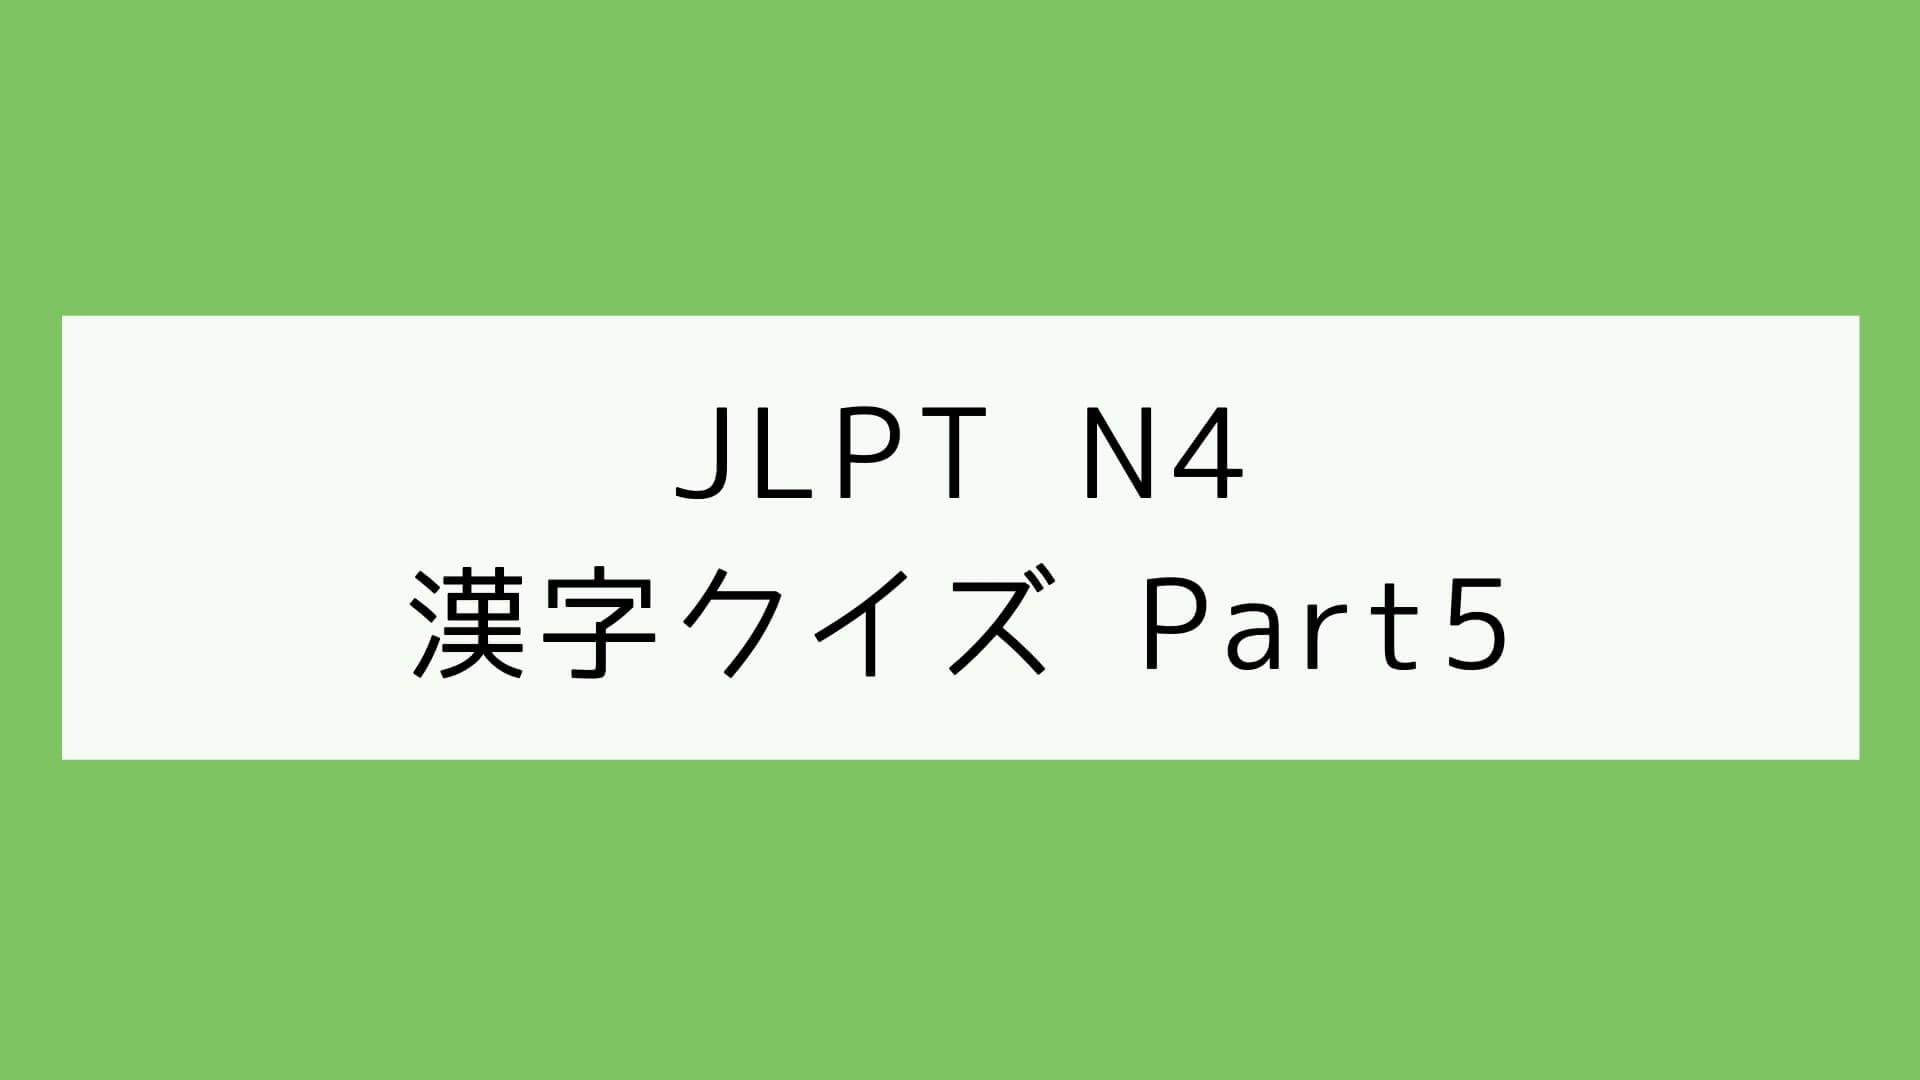 【JLPT N4】漢字クイズ Part5